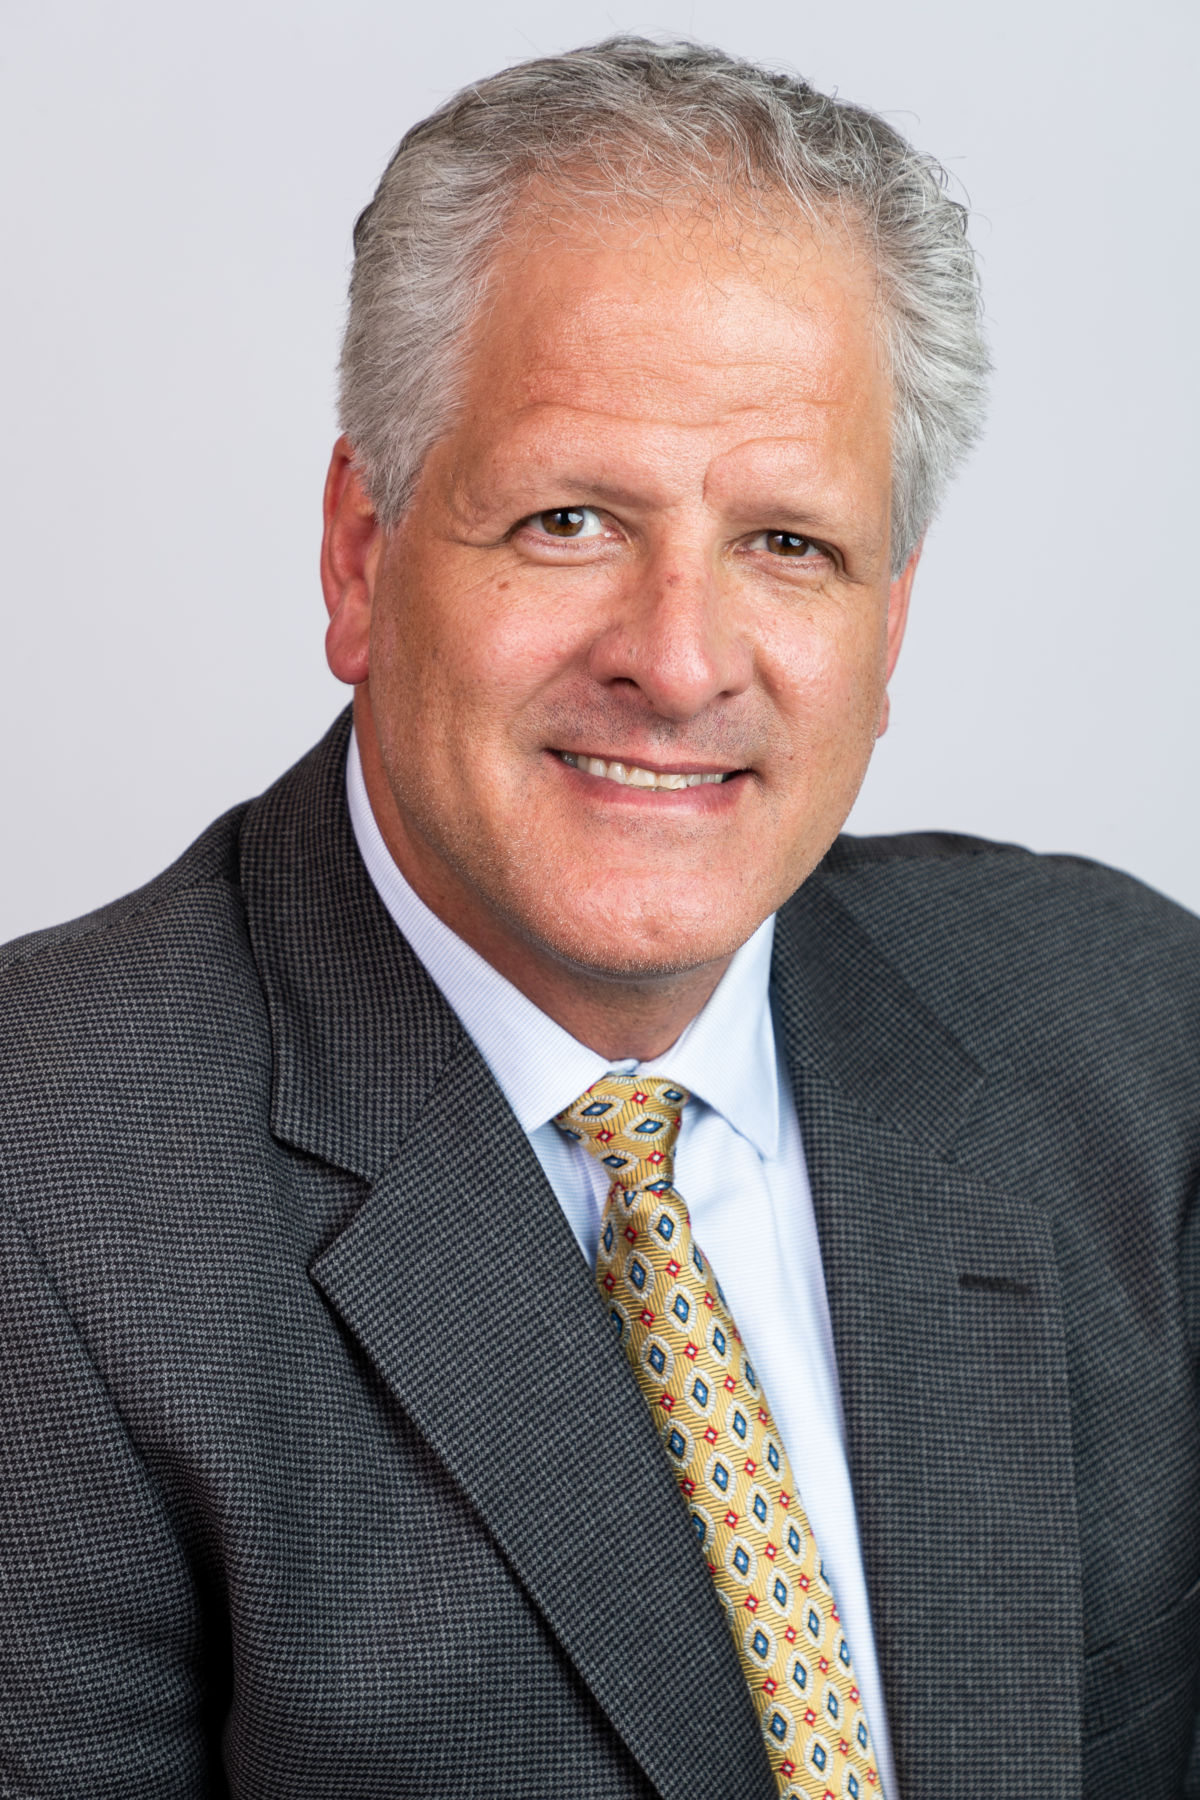 Chad M. Kessler, M.D.